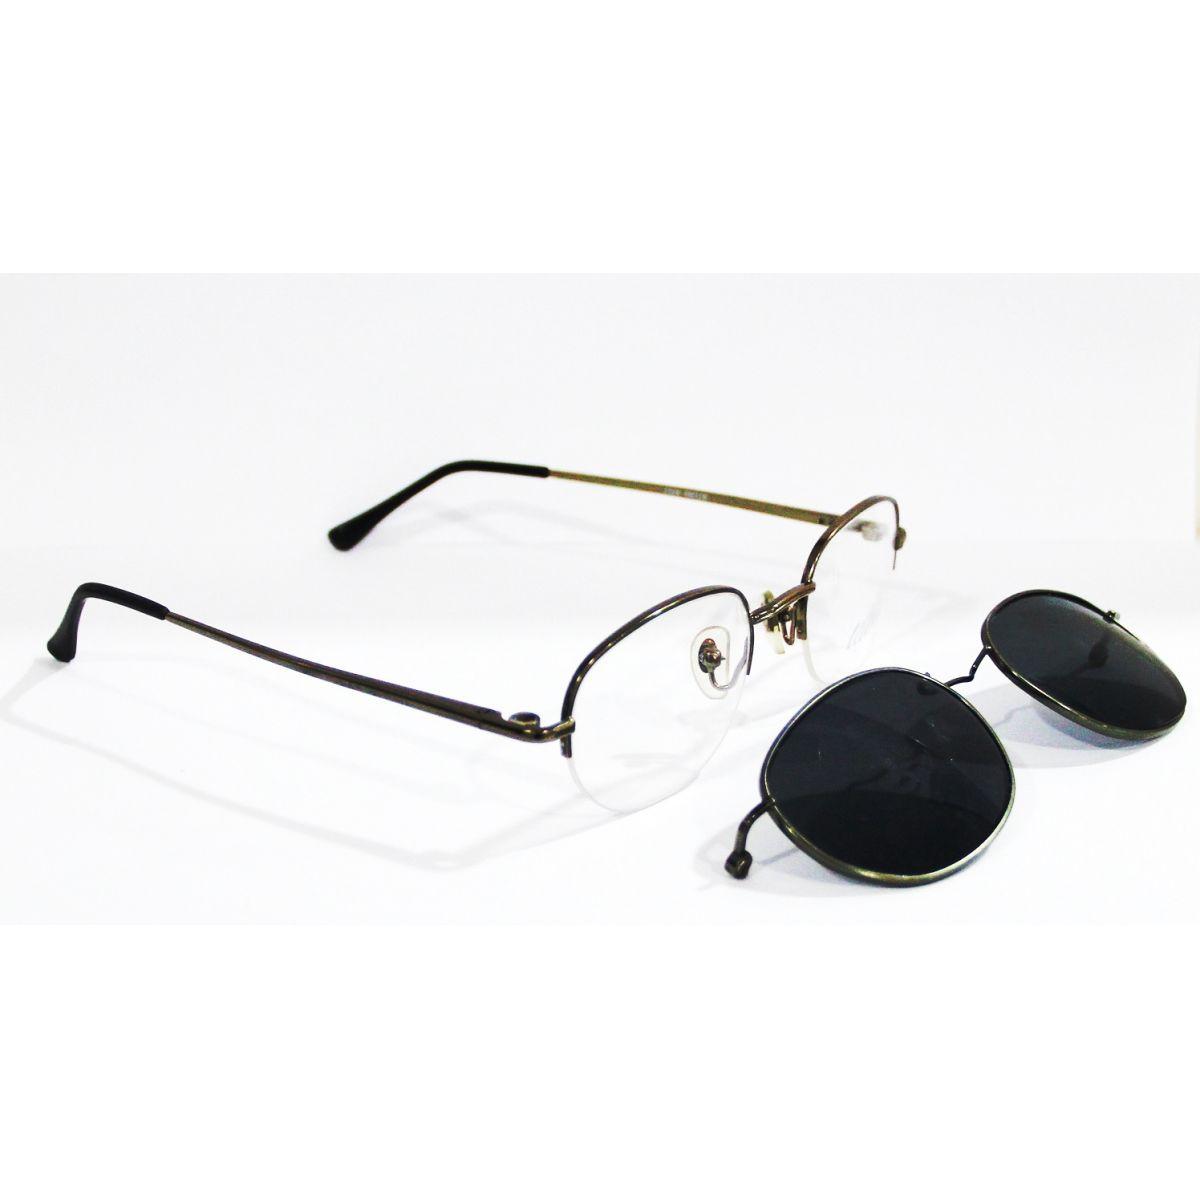 871a7d1b6 óculos Esportivo Clip-on Suporte Lentes De Grau - Bitterroot Public ...